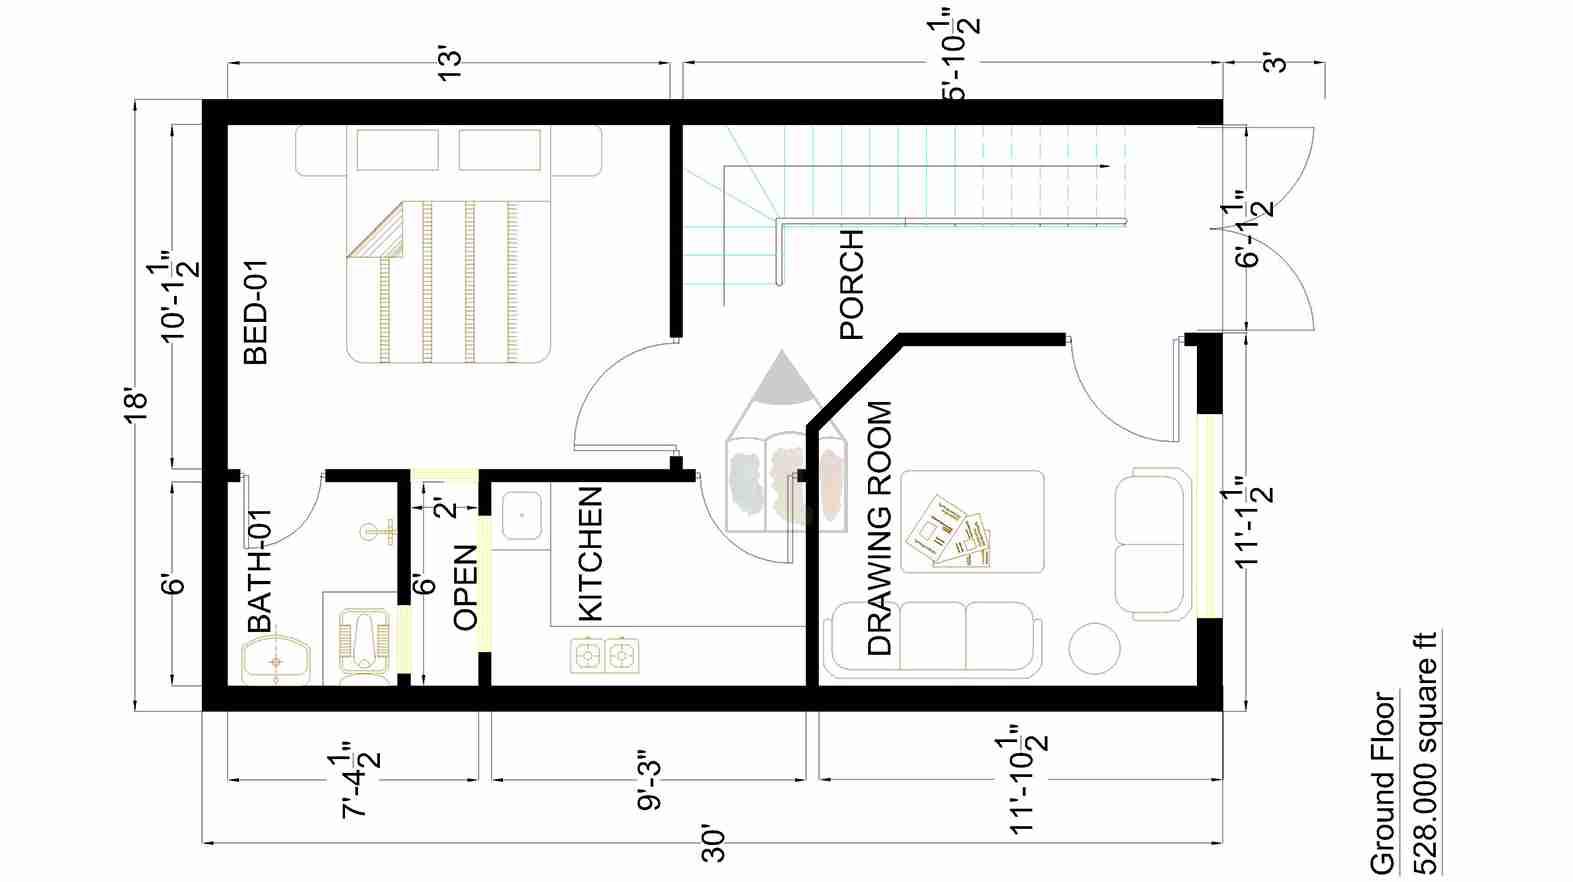 1573x882 Marla House Design Plan Gharplans Pk